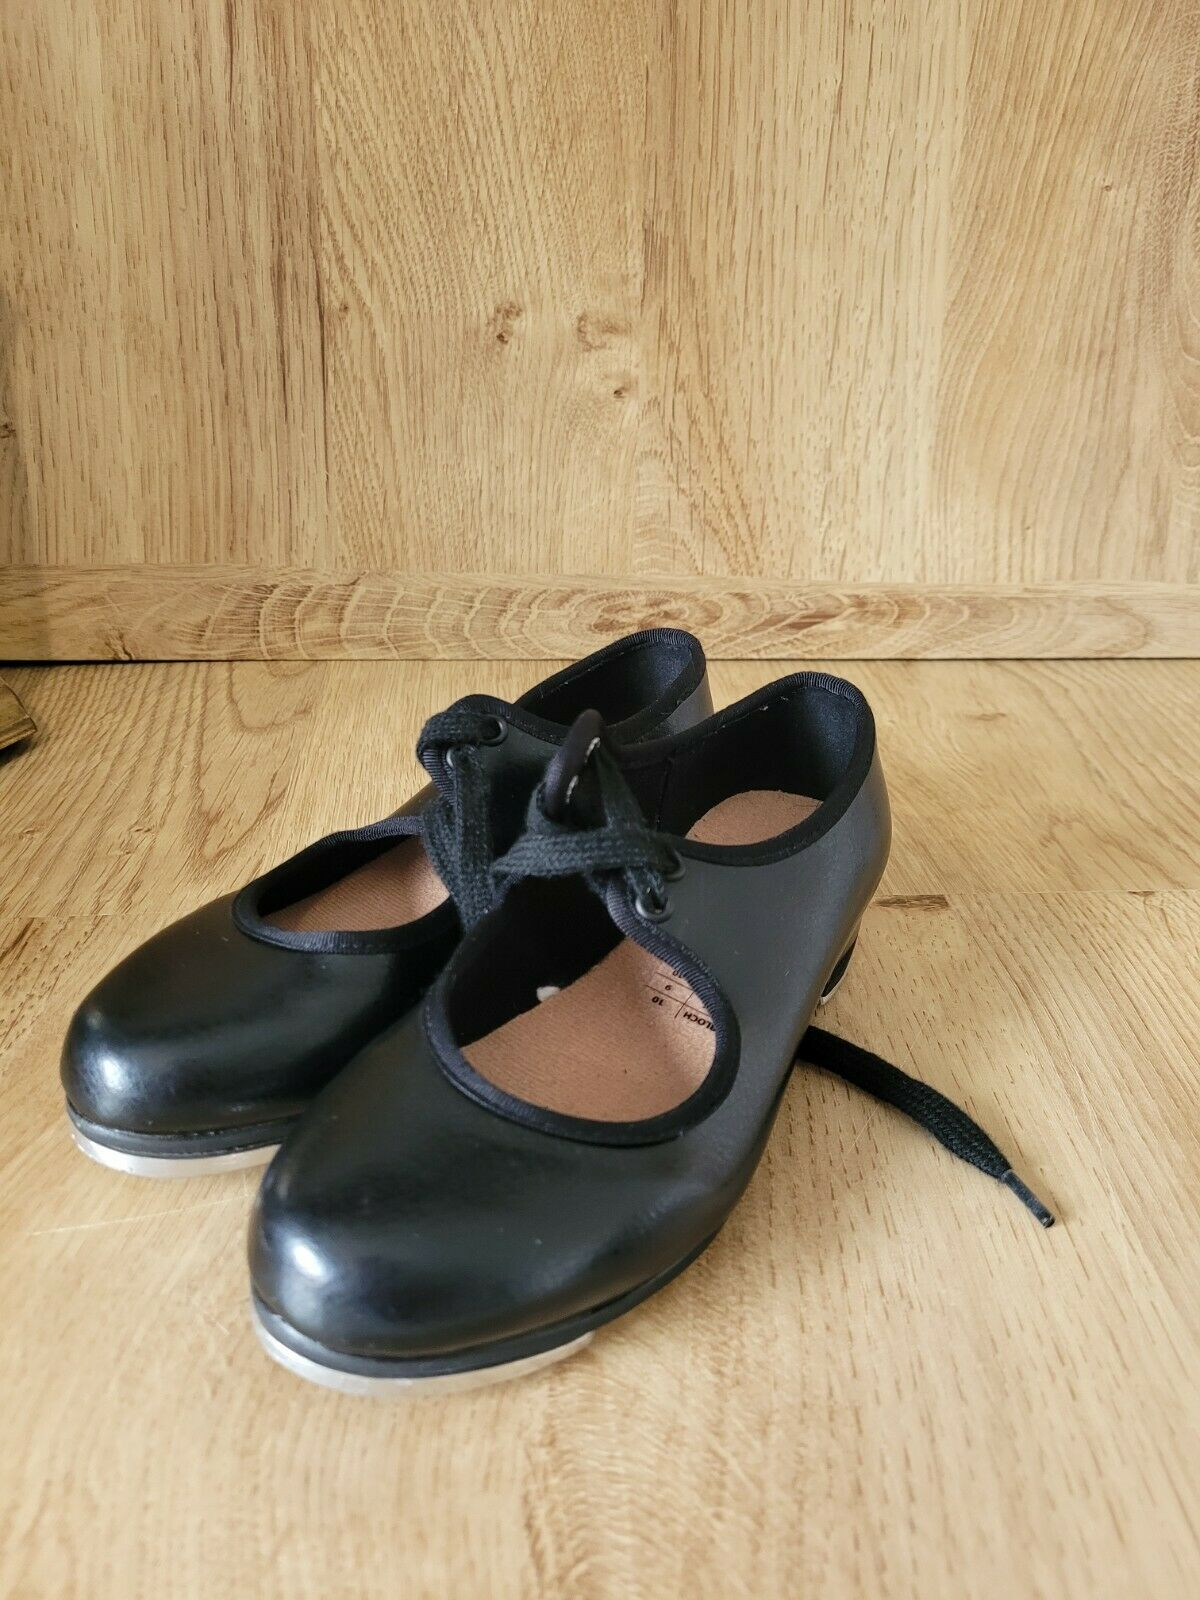 bloch tap shoes Size 9